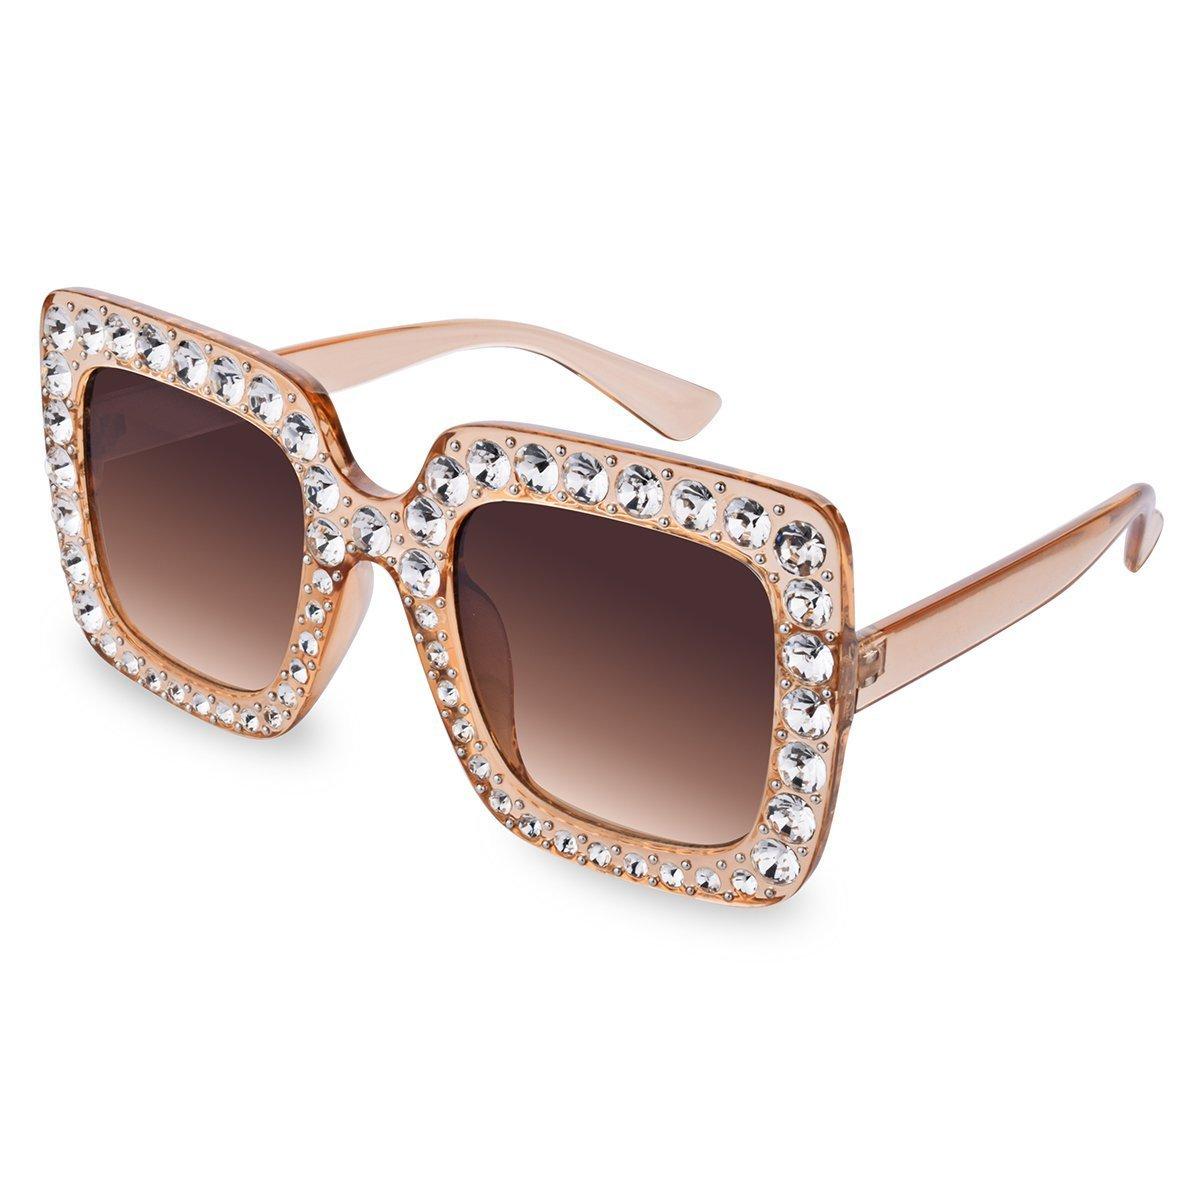 iGOOD Oversized Square Crystal Sunglasses Brand Designer Shades For Women